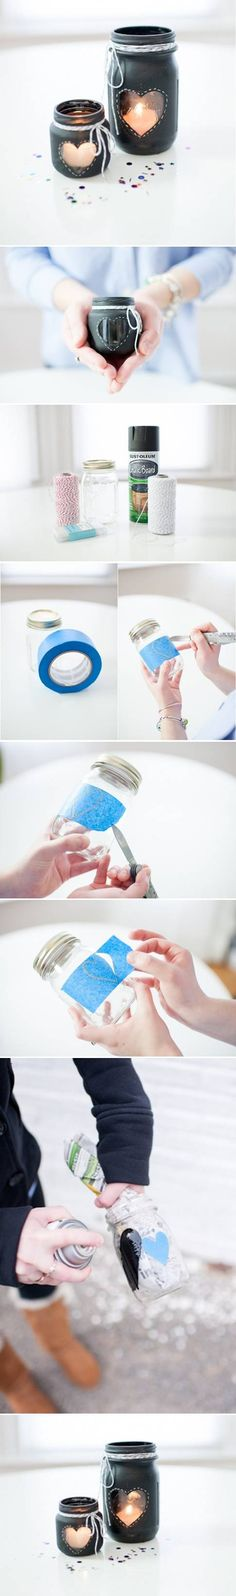 DIY Glass Jar Candlestick